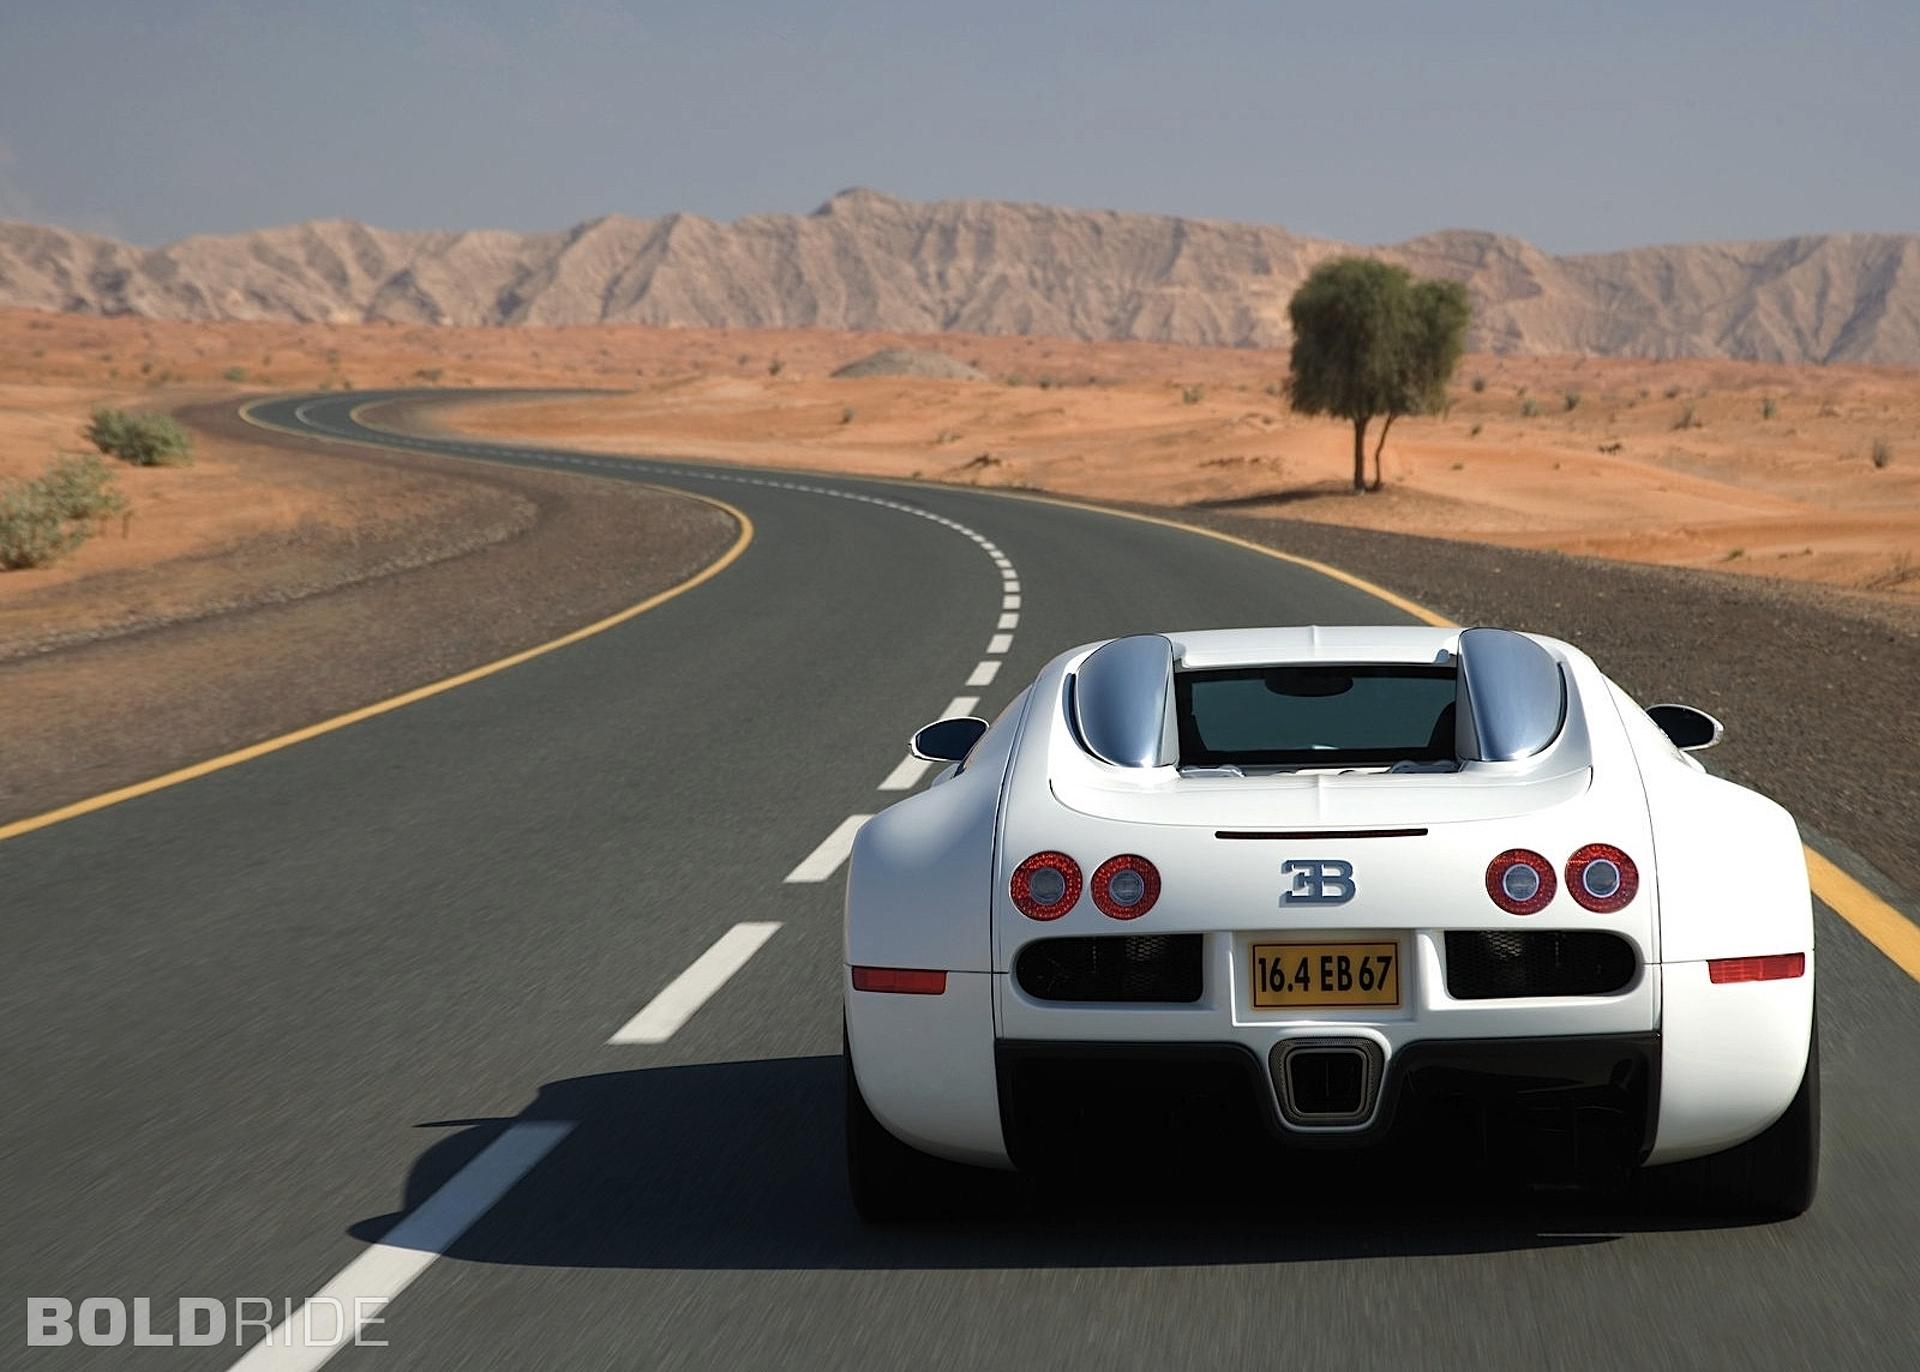 bugatti-veyron Wonderful Bugatti Veyron On Road Price Cars Trend